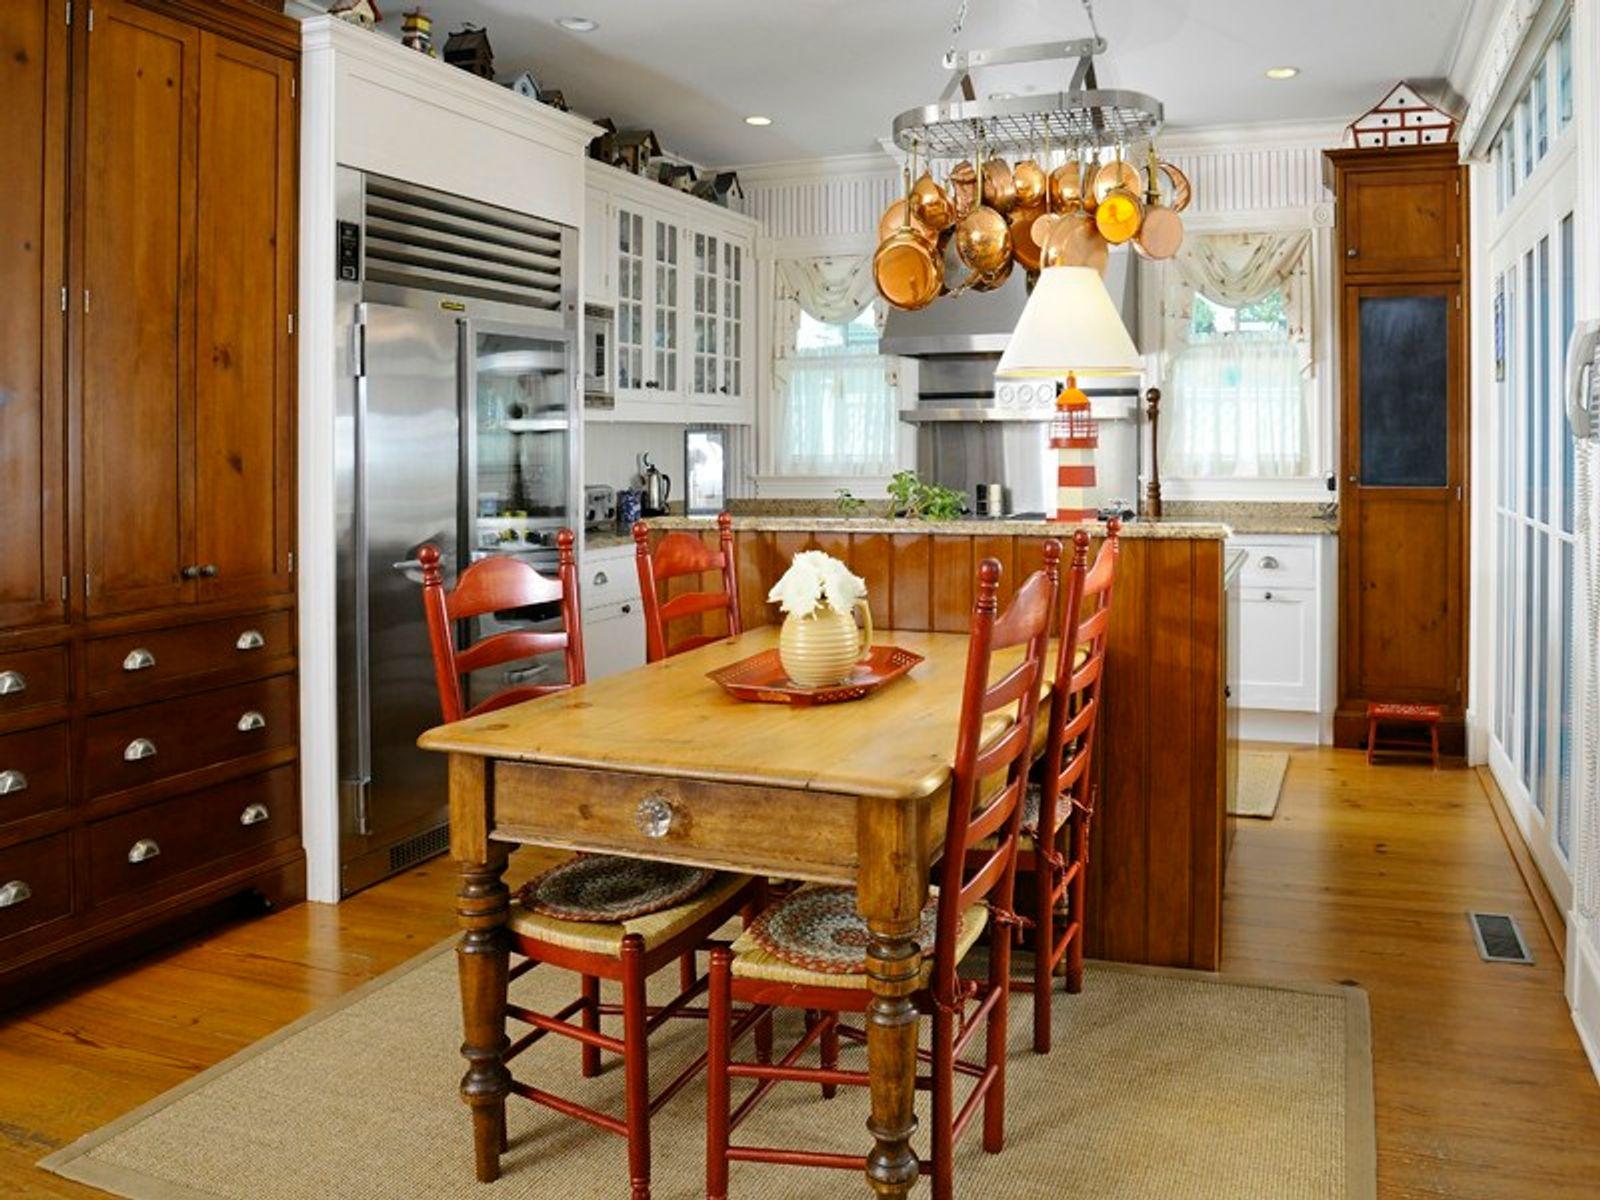 Gourmet kitchen with island